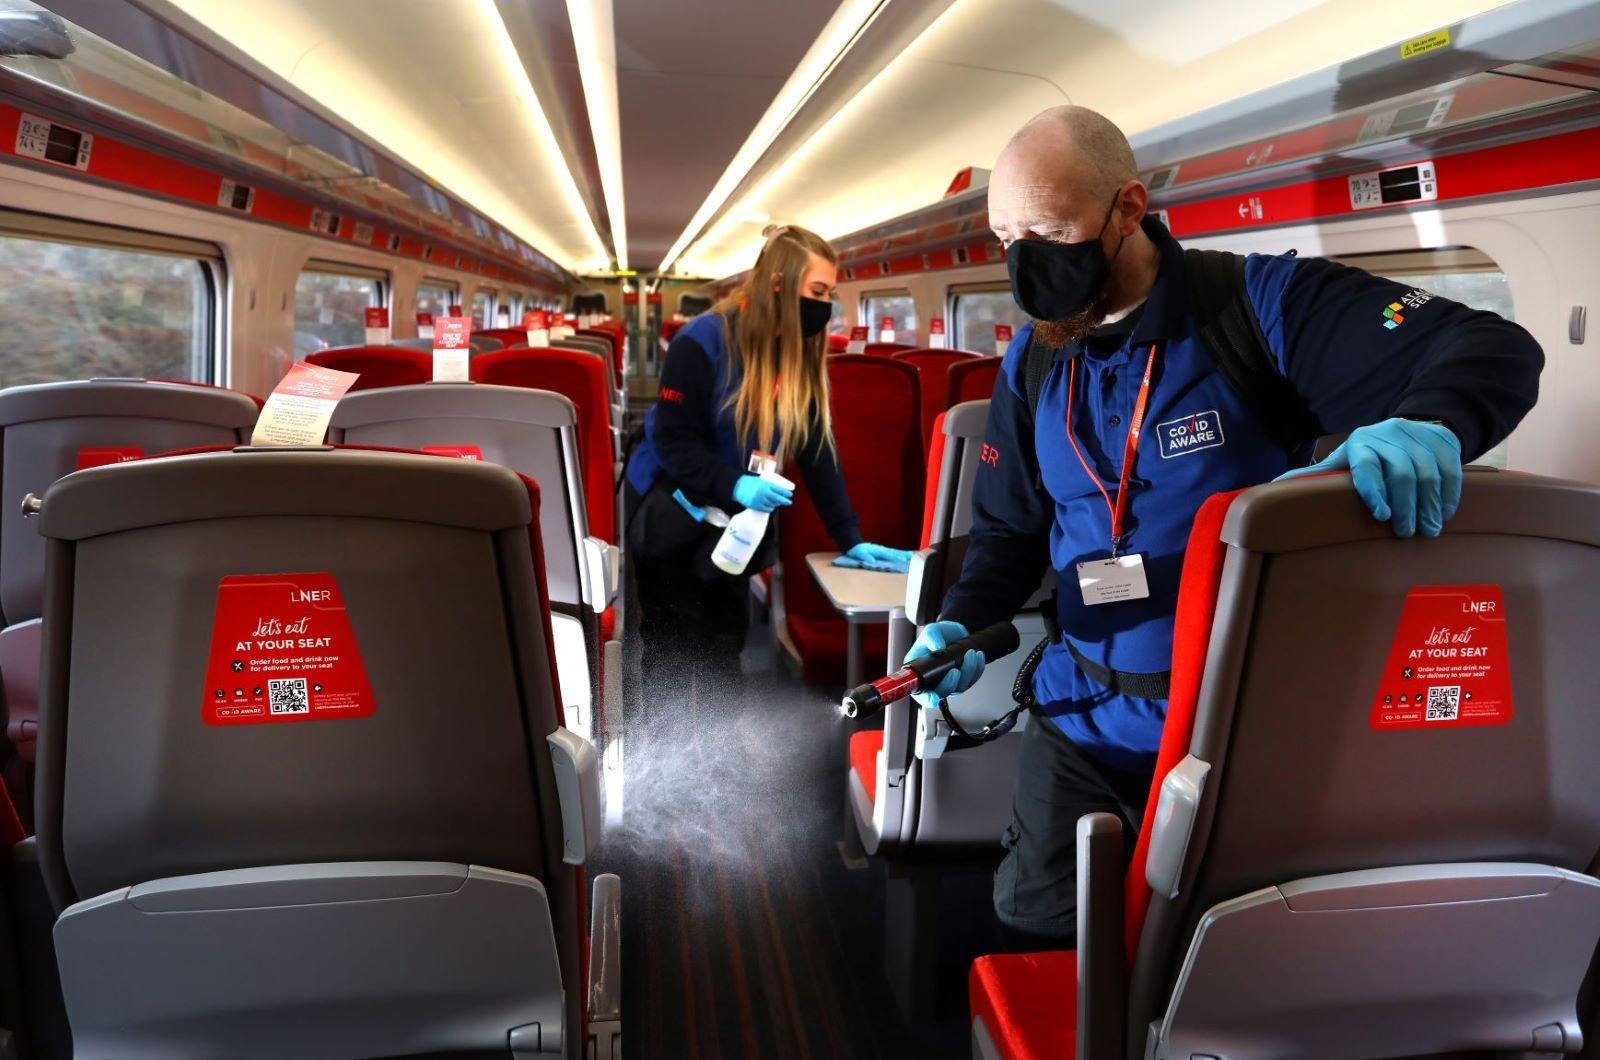 LNER Cleaning Partnership Shortlisted For Prestigious National Award